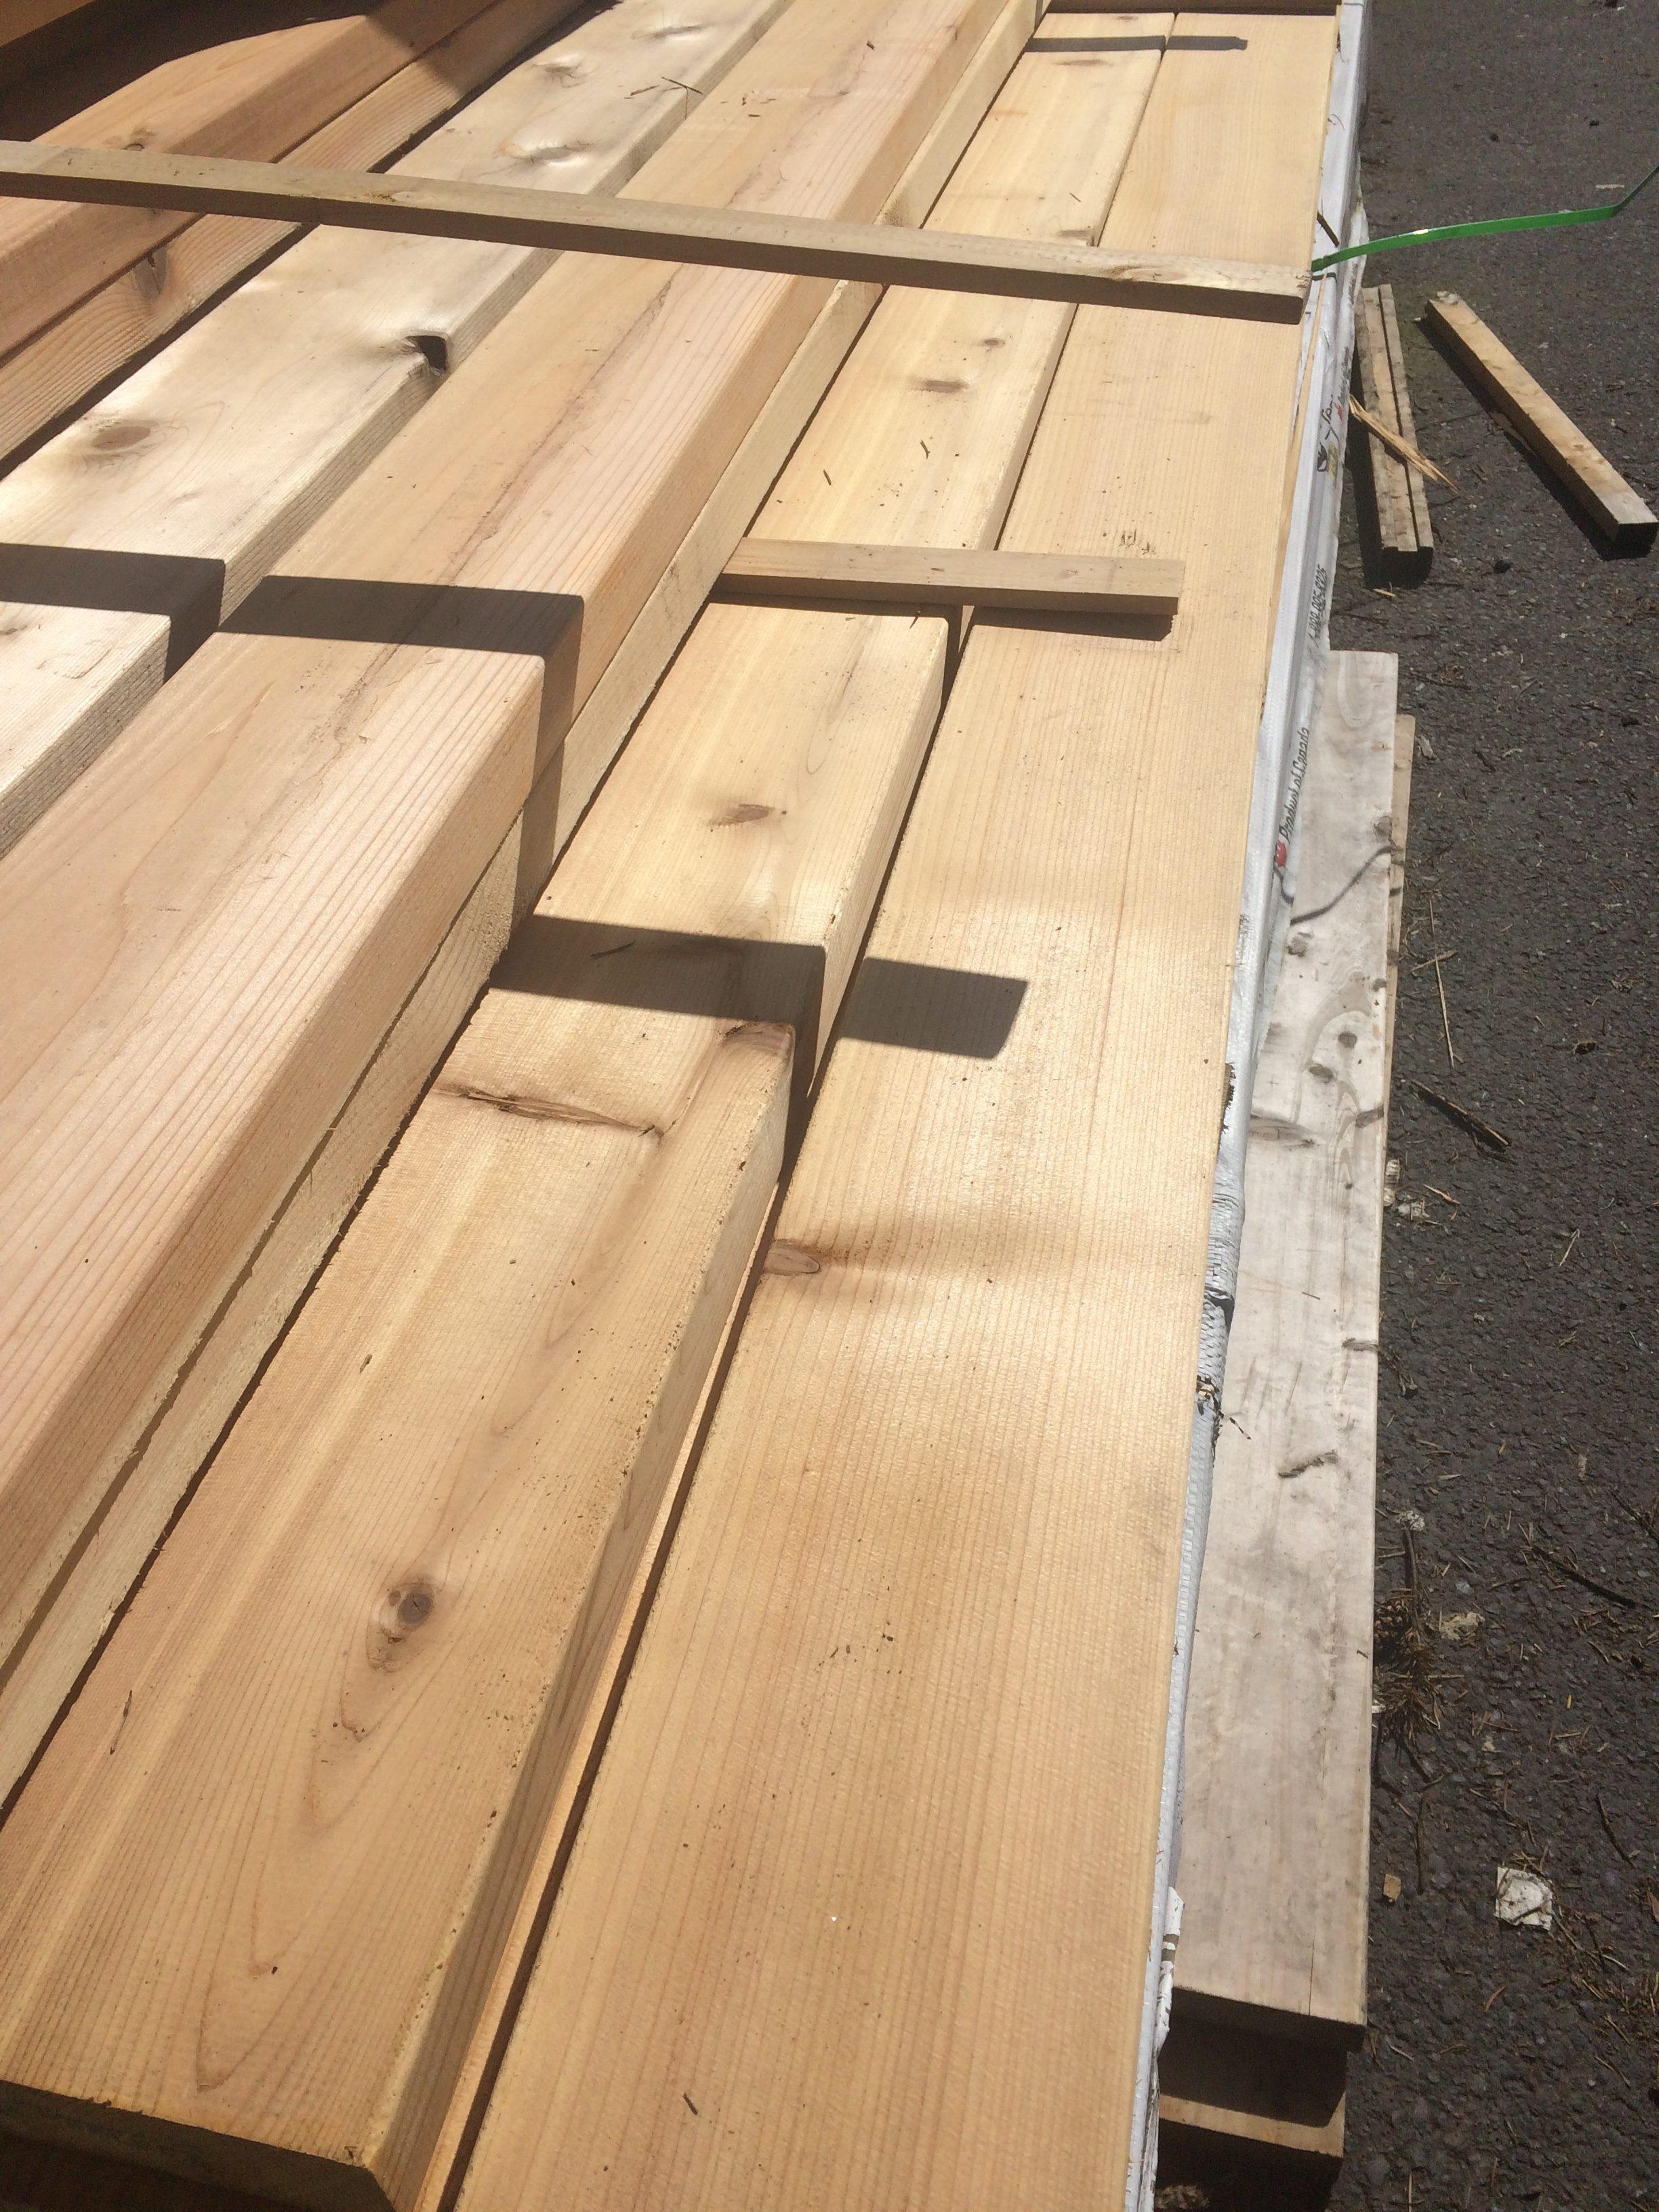 2 215 6 16 Western Red Cedar Select Knotty Kiln Dried Decking